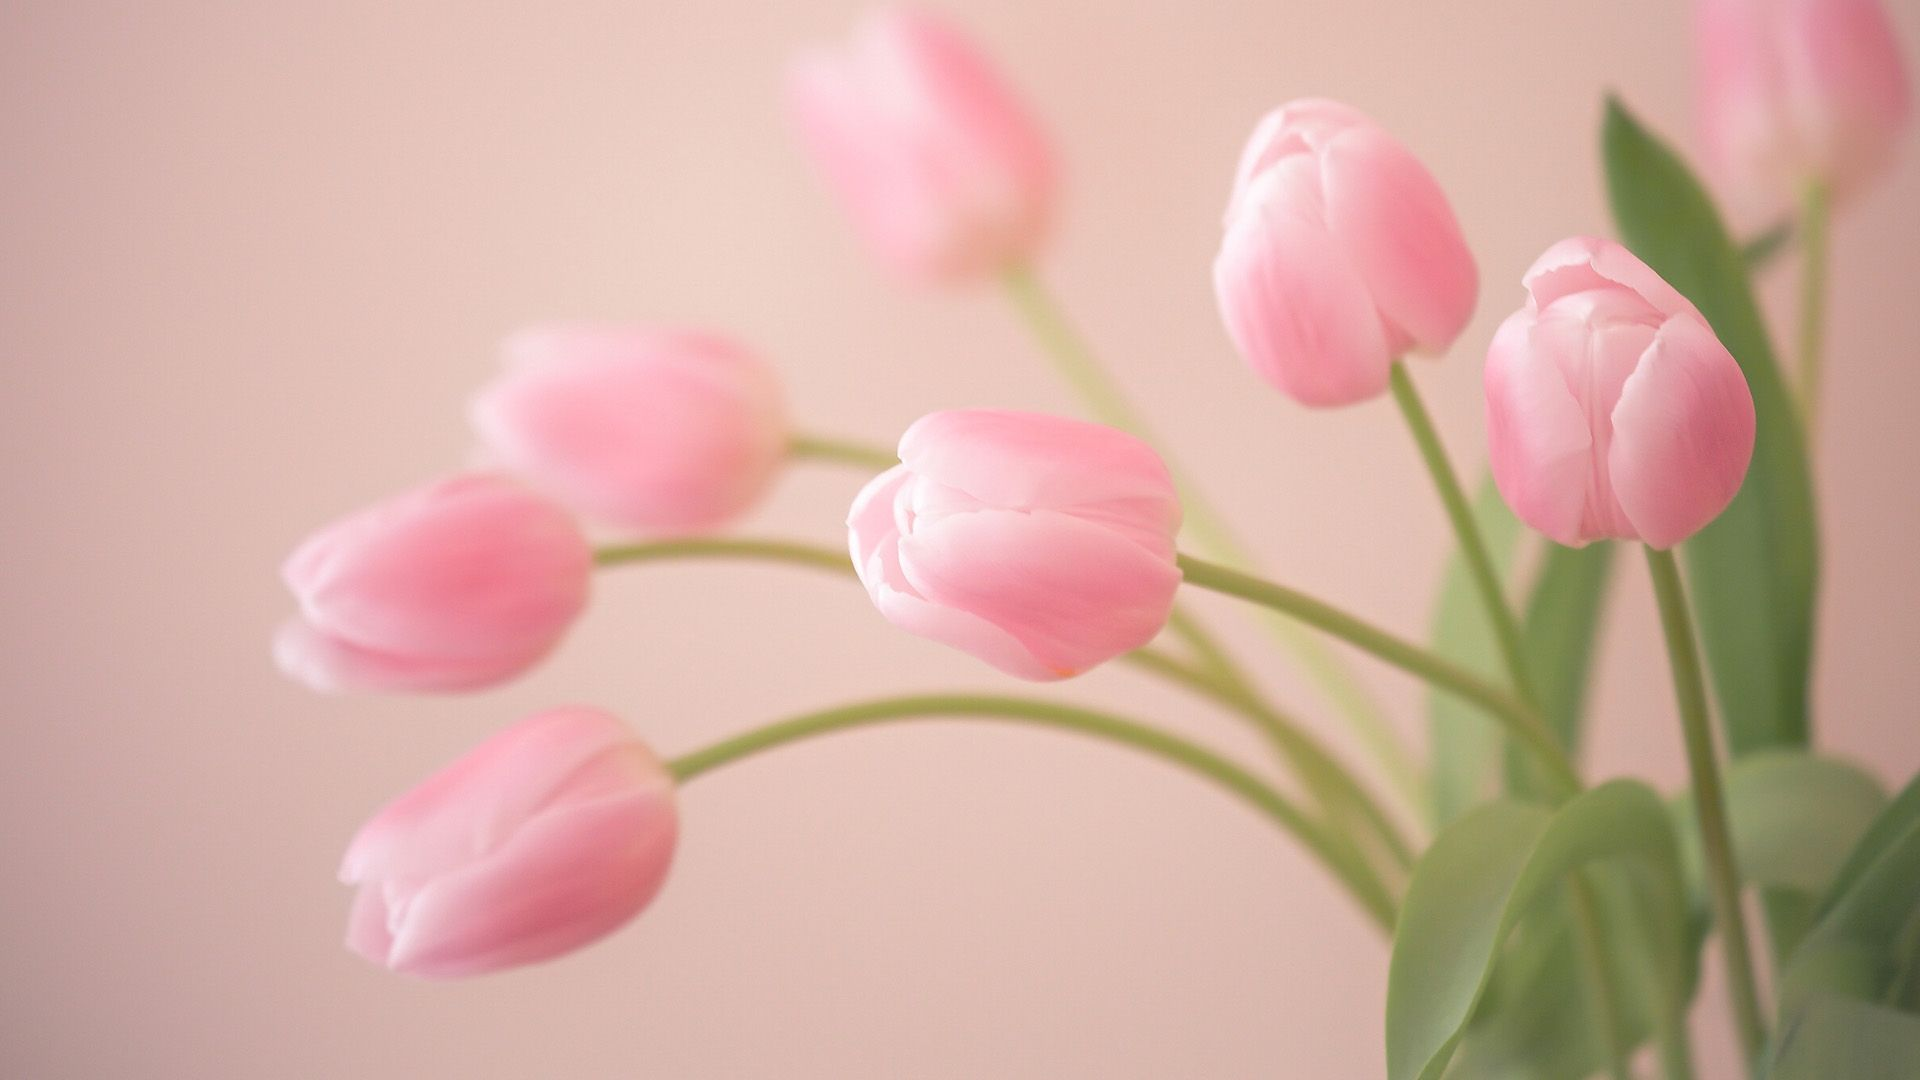 tulip photos free download